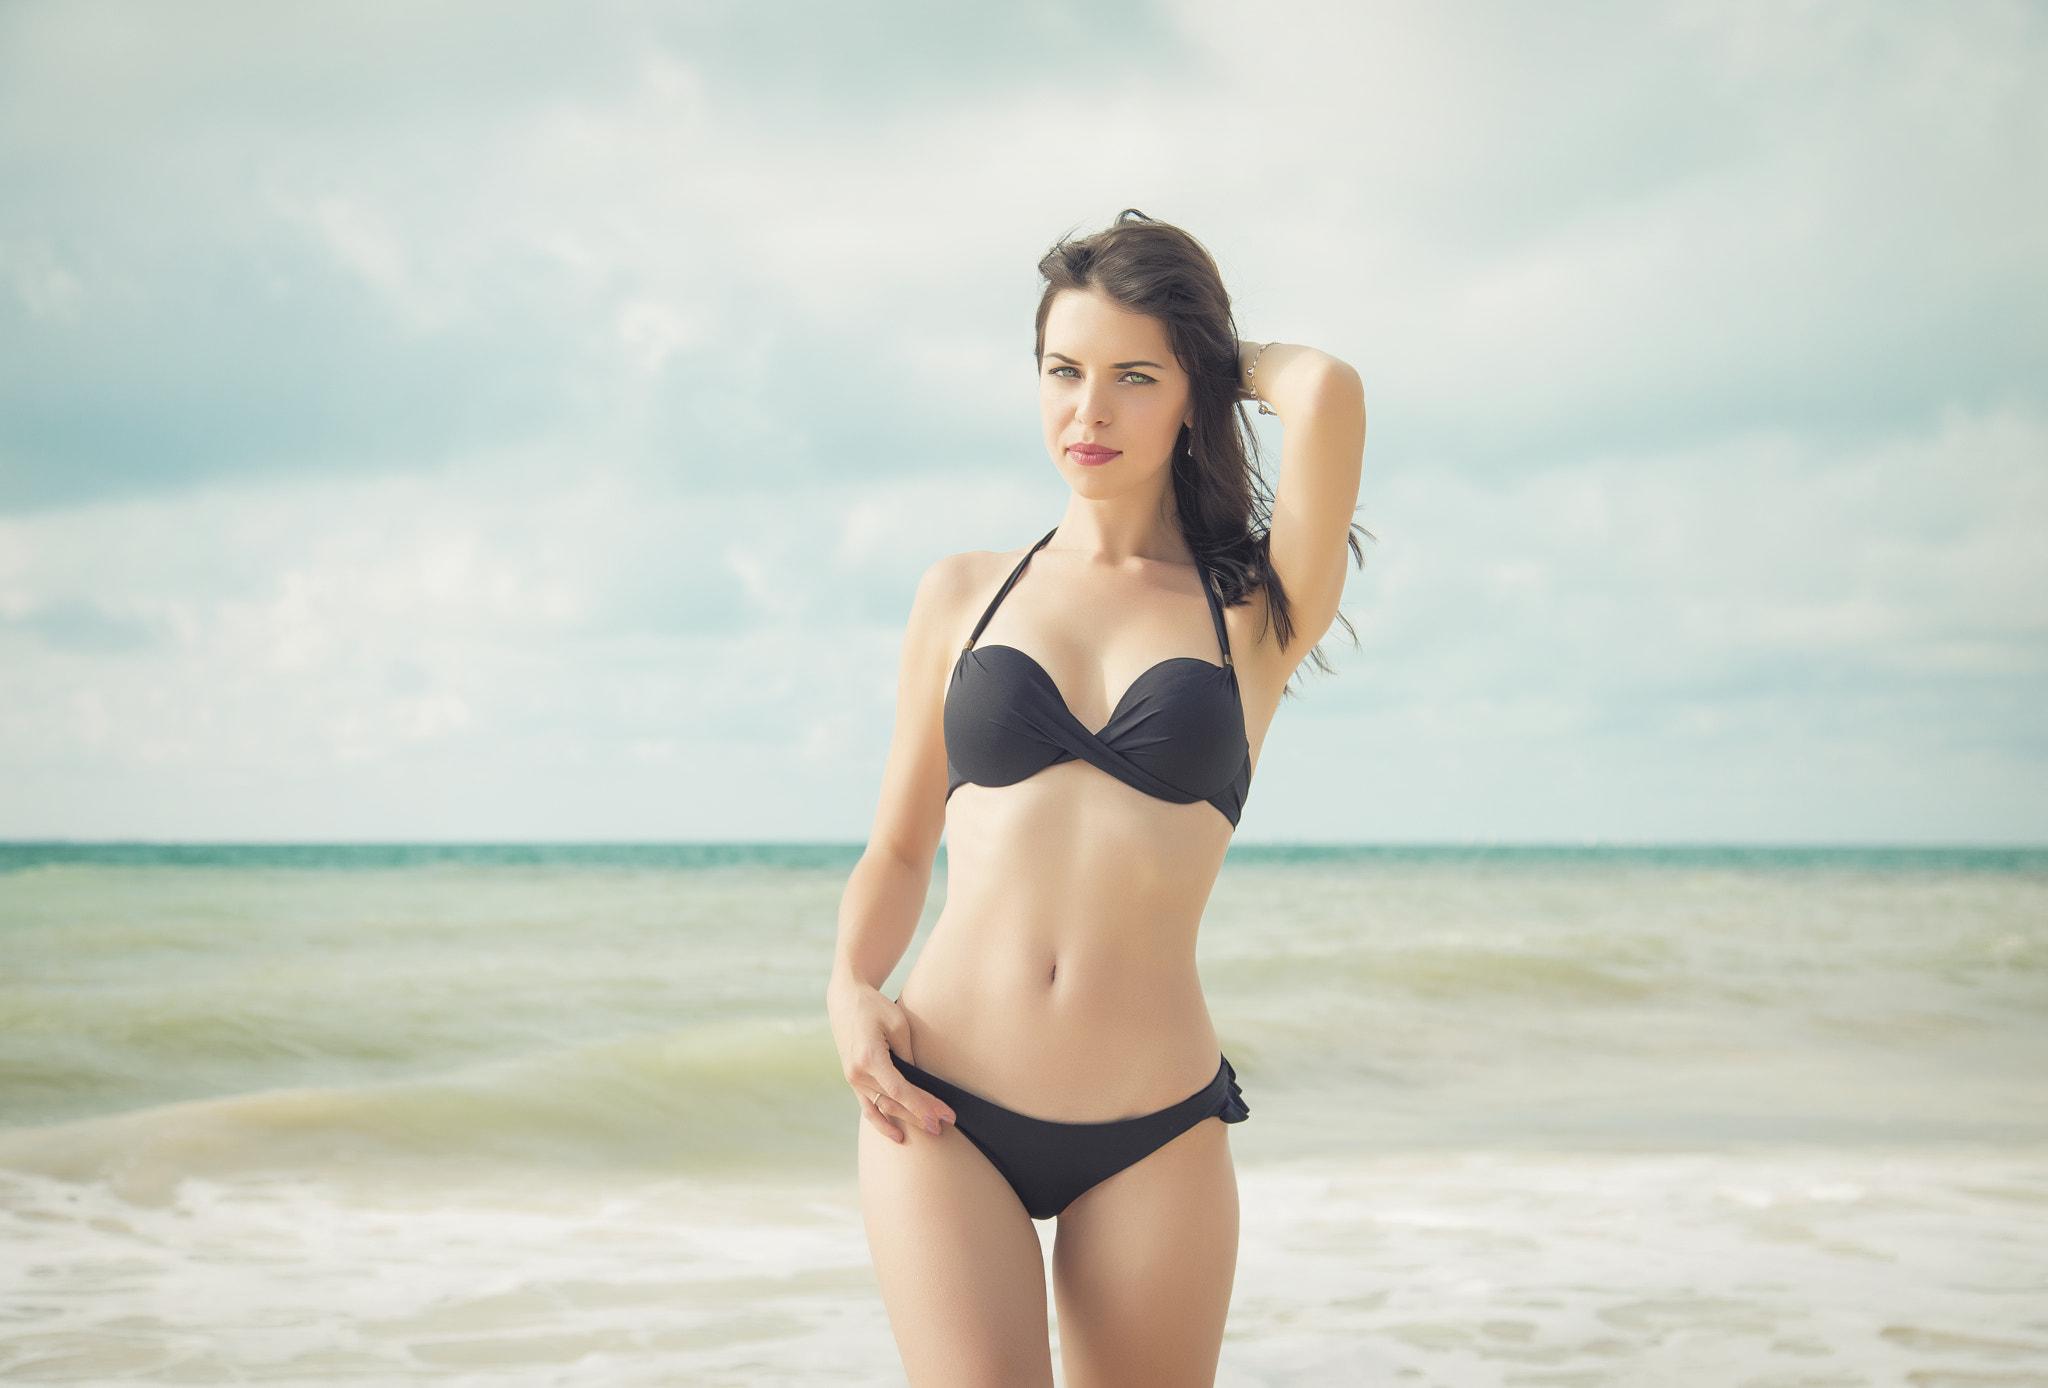 Seafolly V Wire Bandeau Bikini Top In Plum